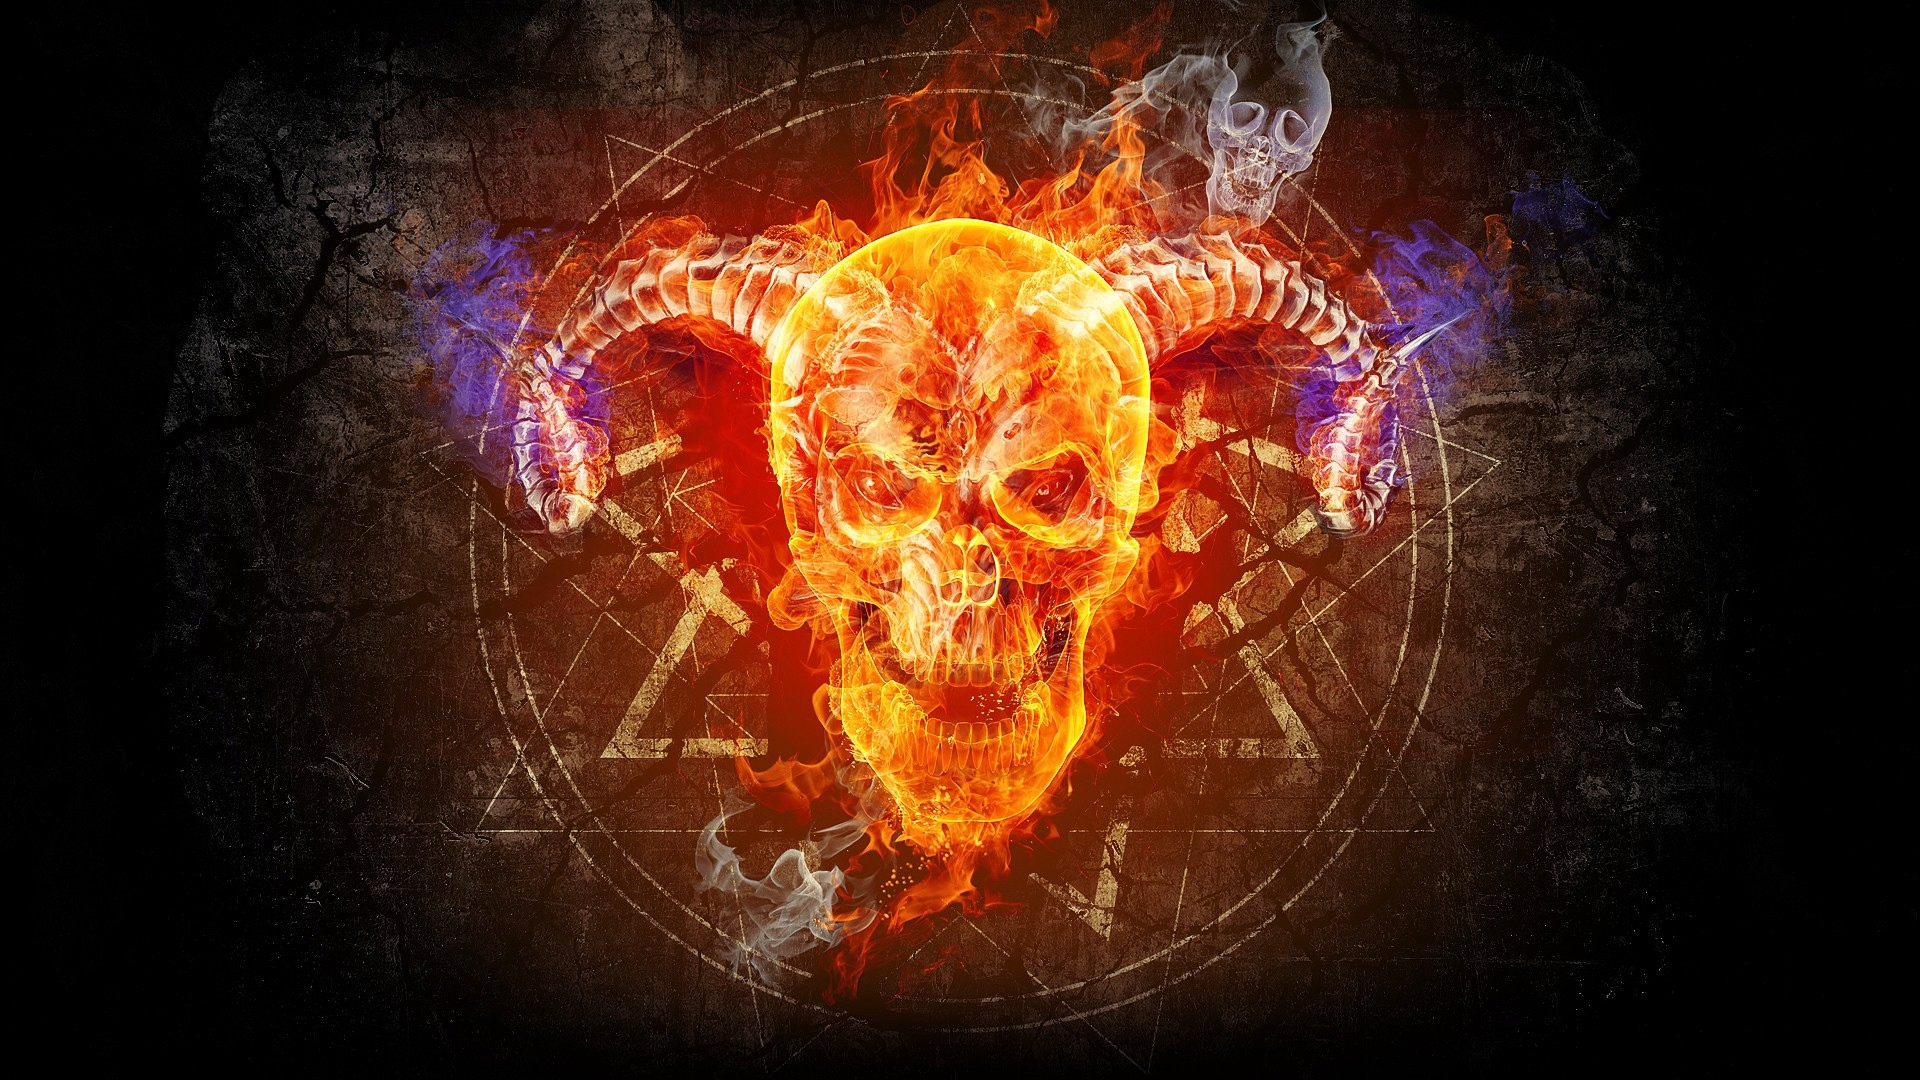 Skull Taro Prophecy Faith Fire Circle   Stock Photos Images 1920x1080